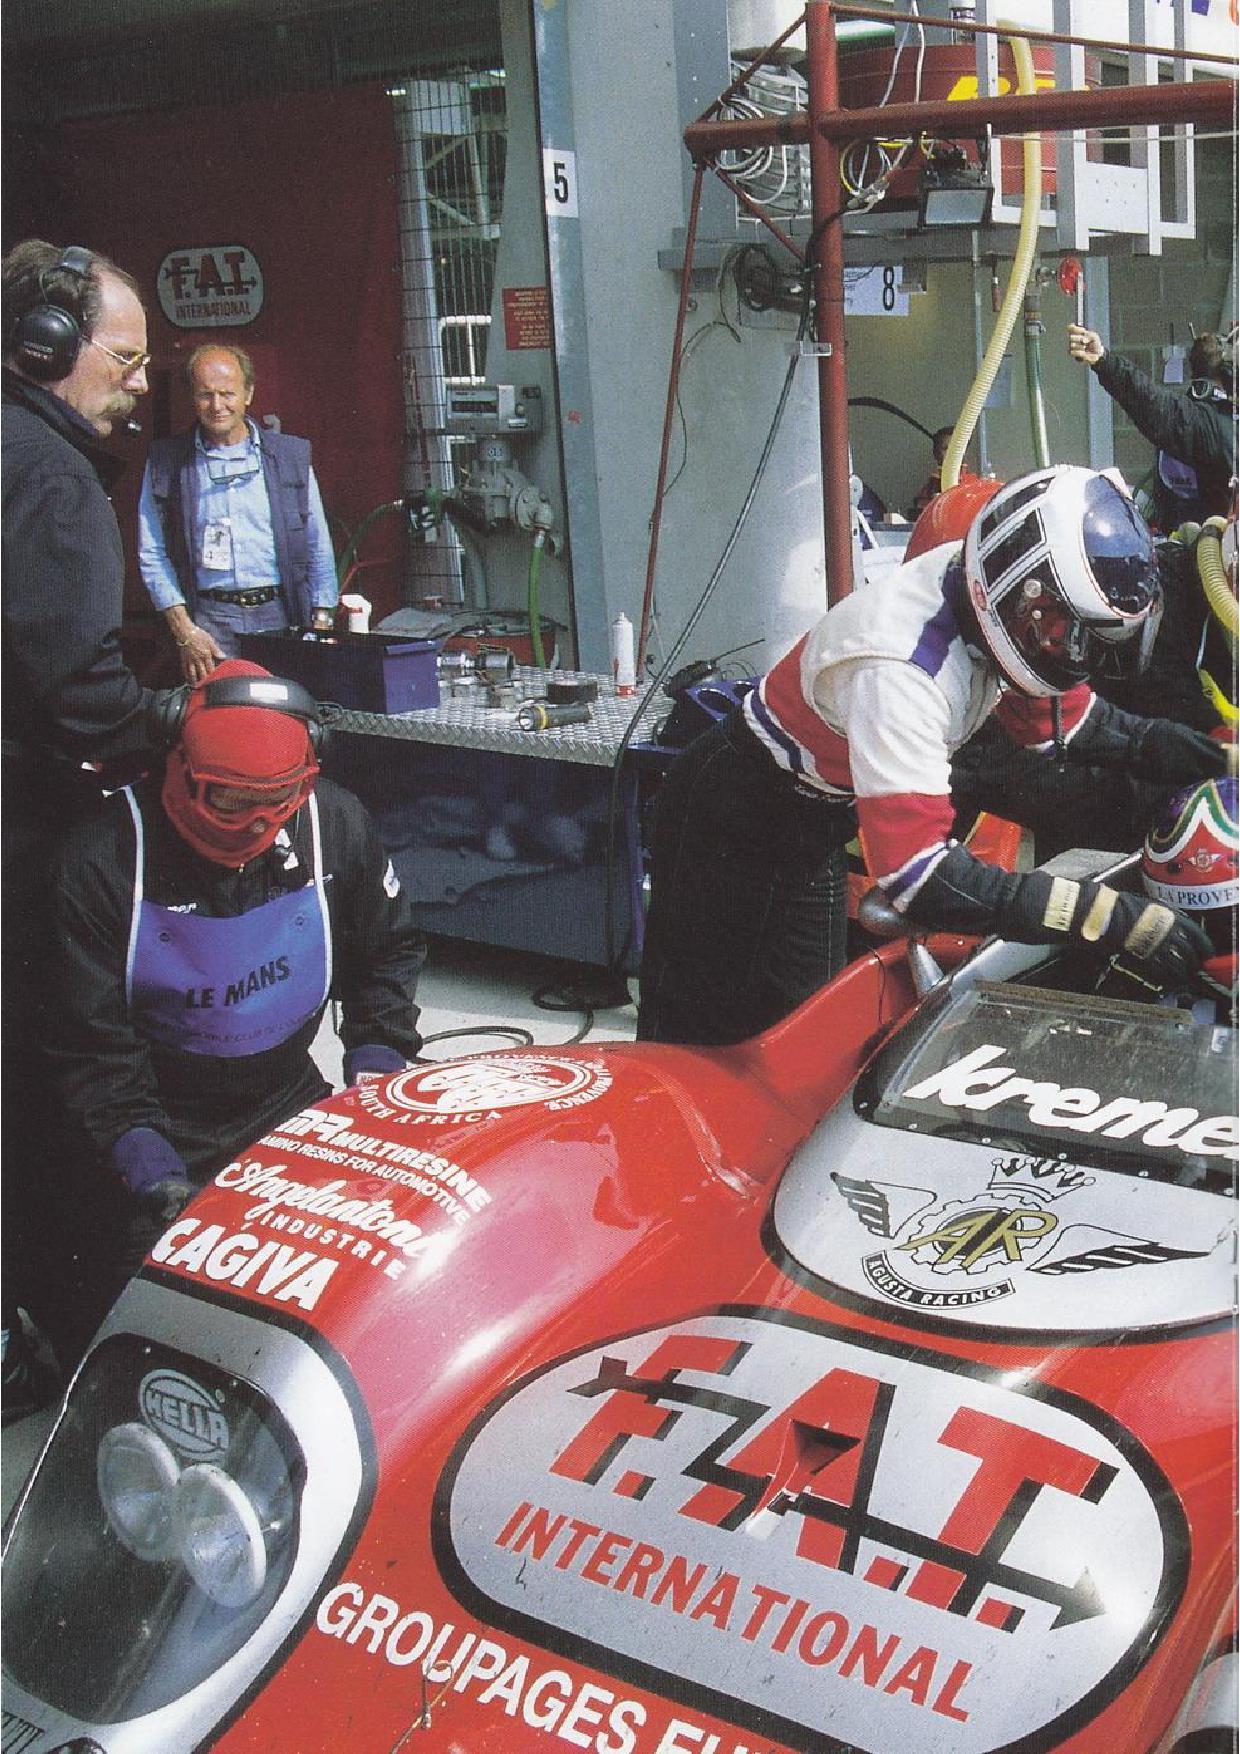 kremer racing in le mans 1970 1998 deutsch porsche cars history. Black Bedroom Furniture Sets. Home Design Ideas